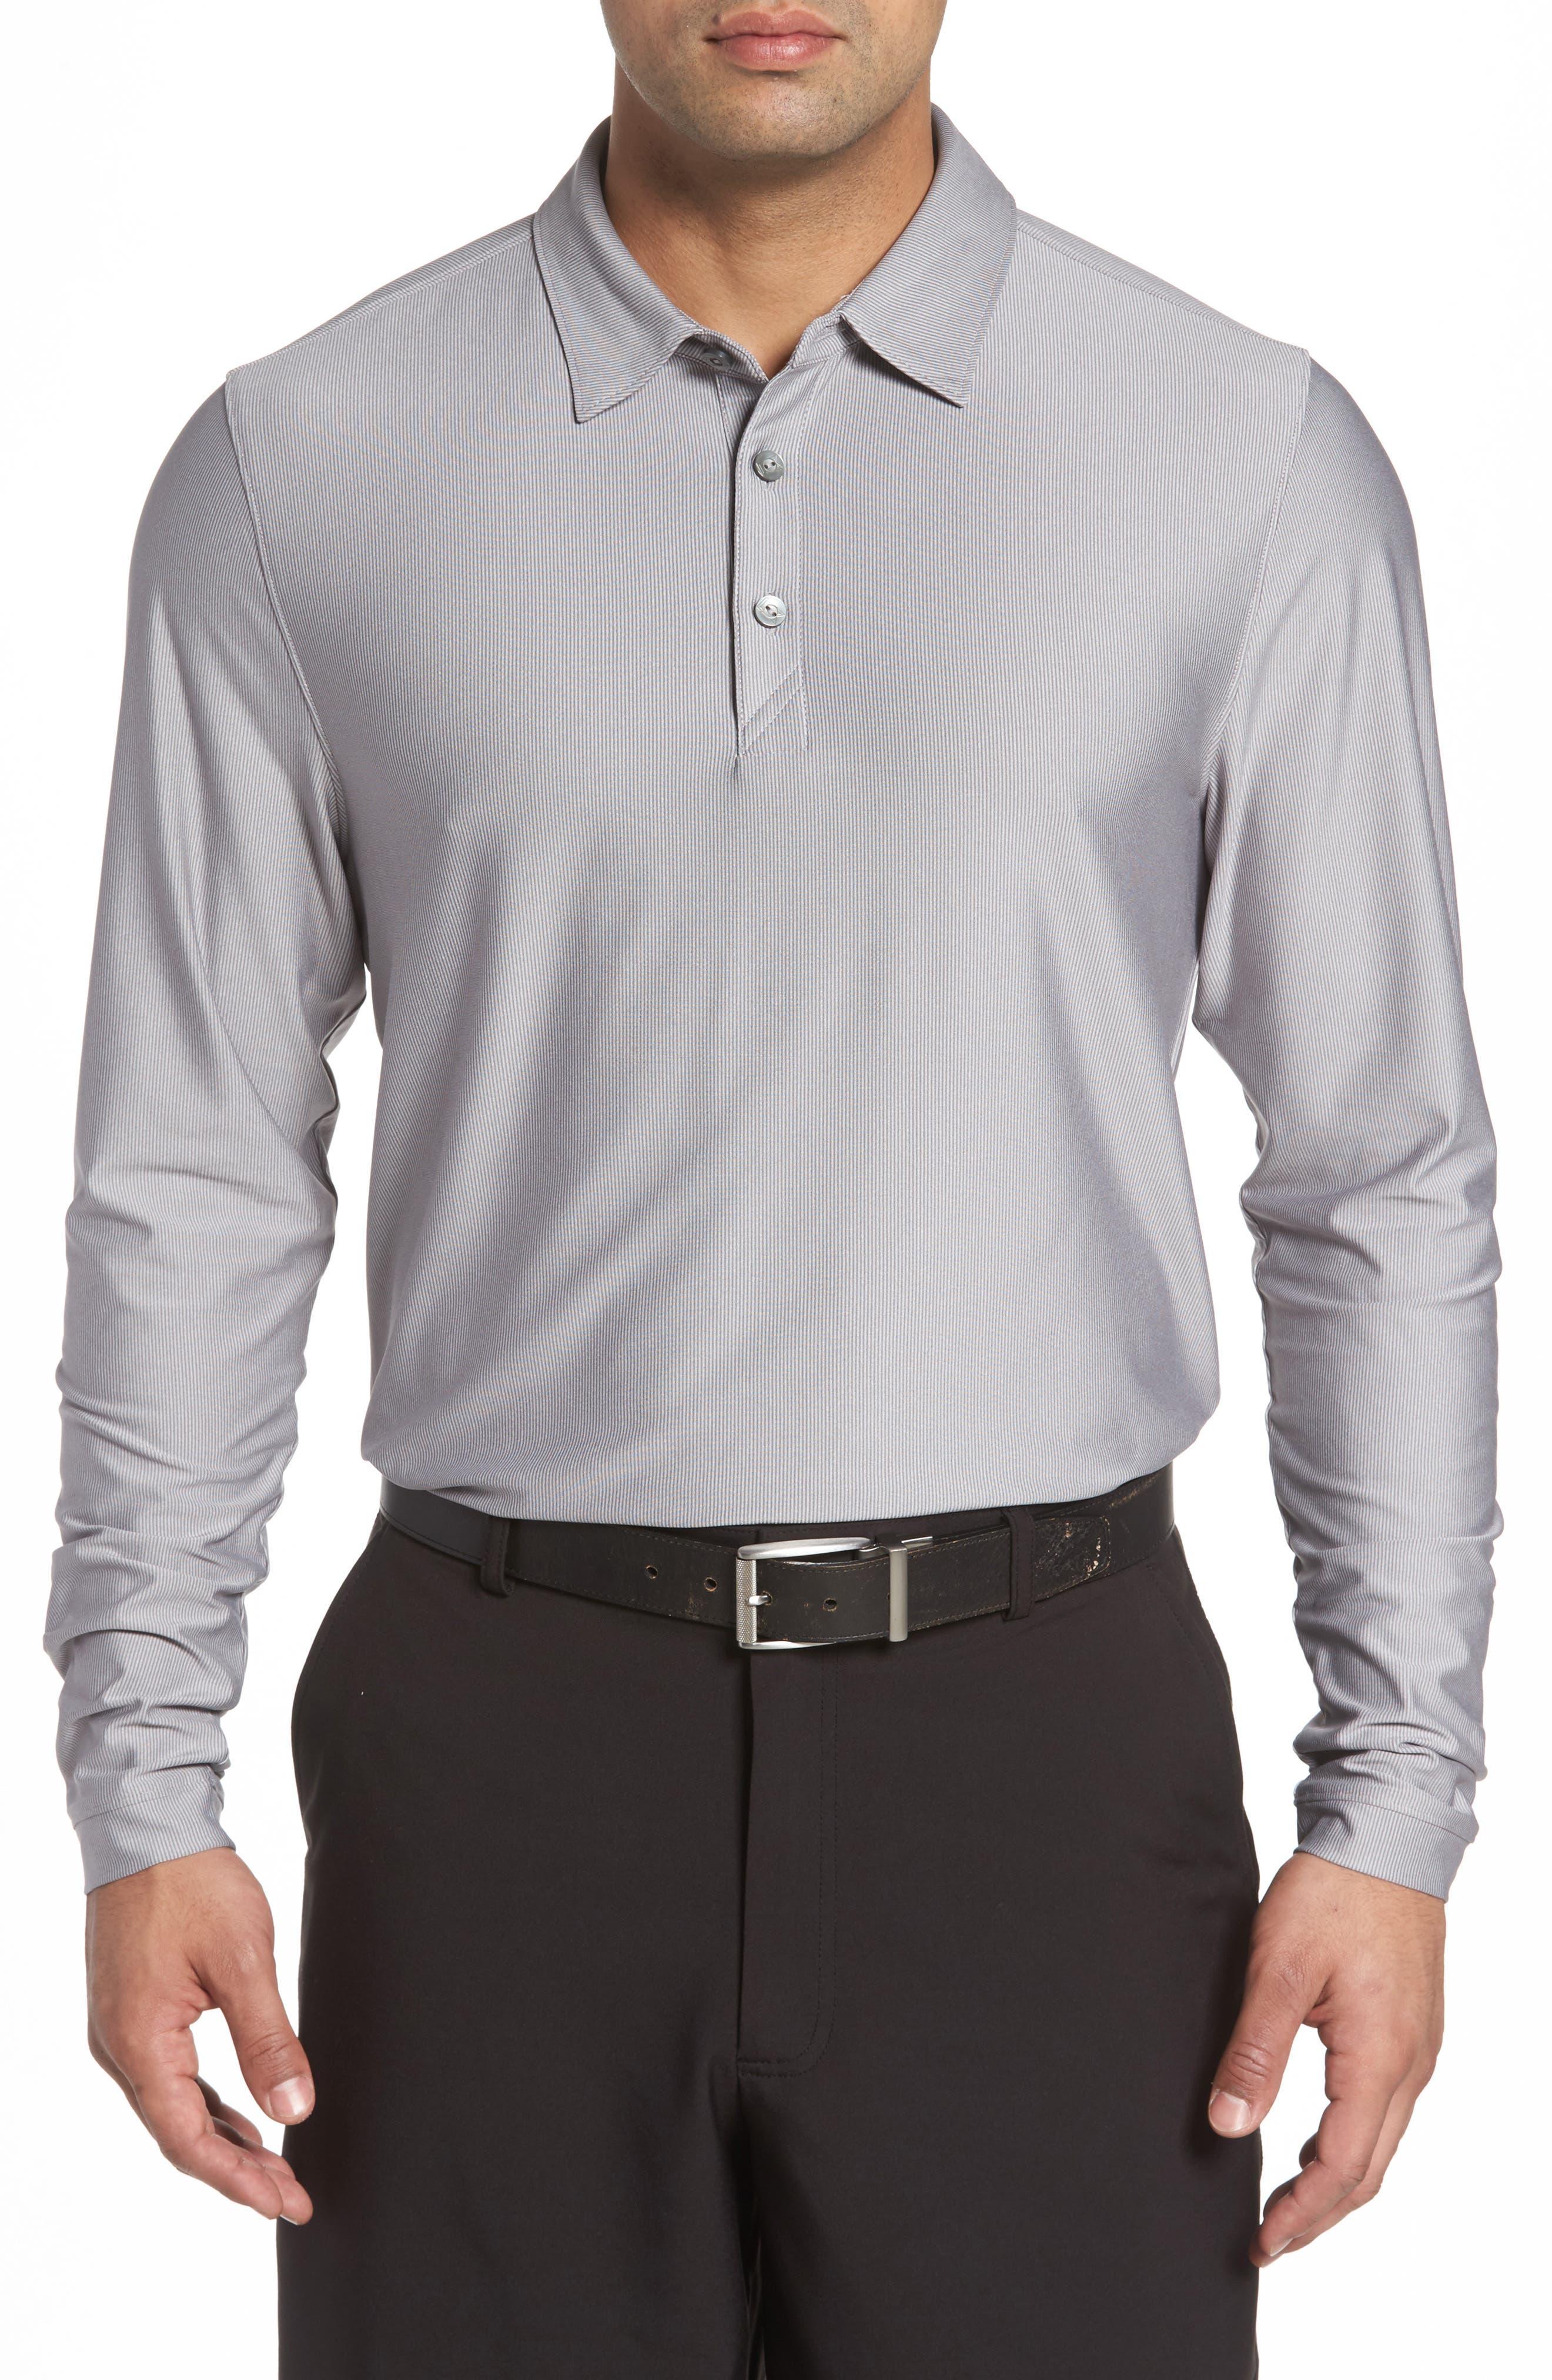 Main Image - Cutter & Buck Cunningham Stripe Jersey Polo